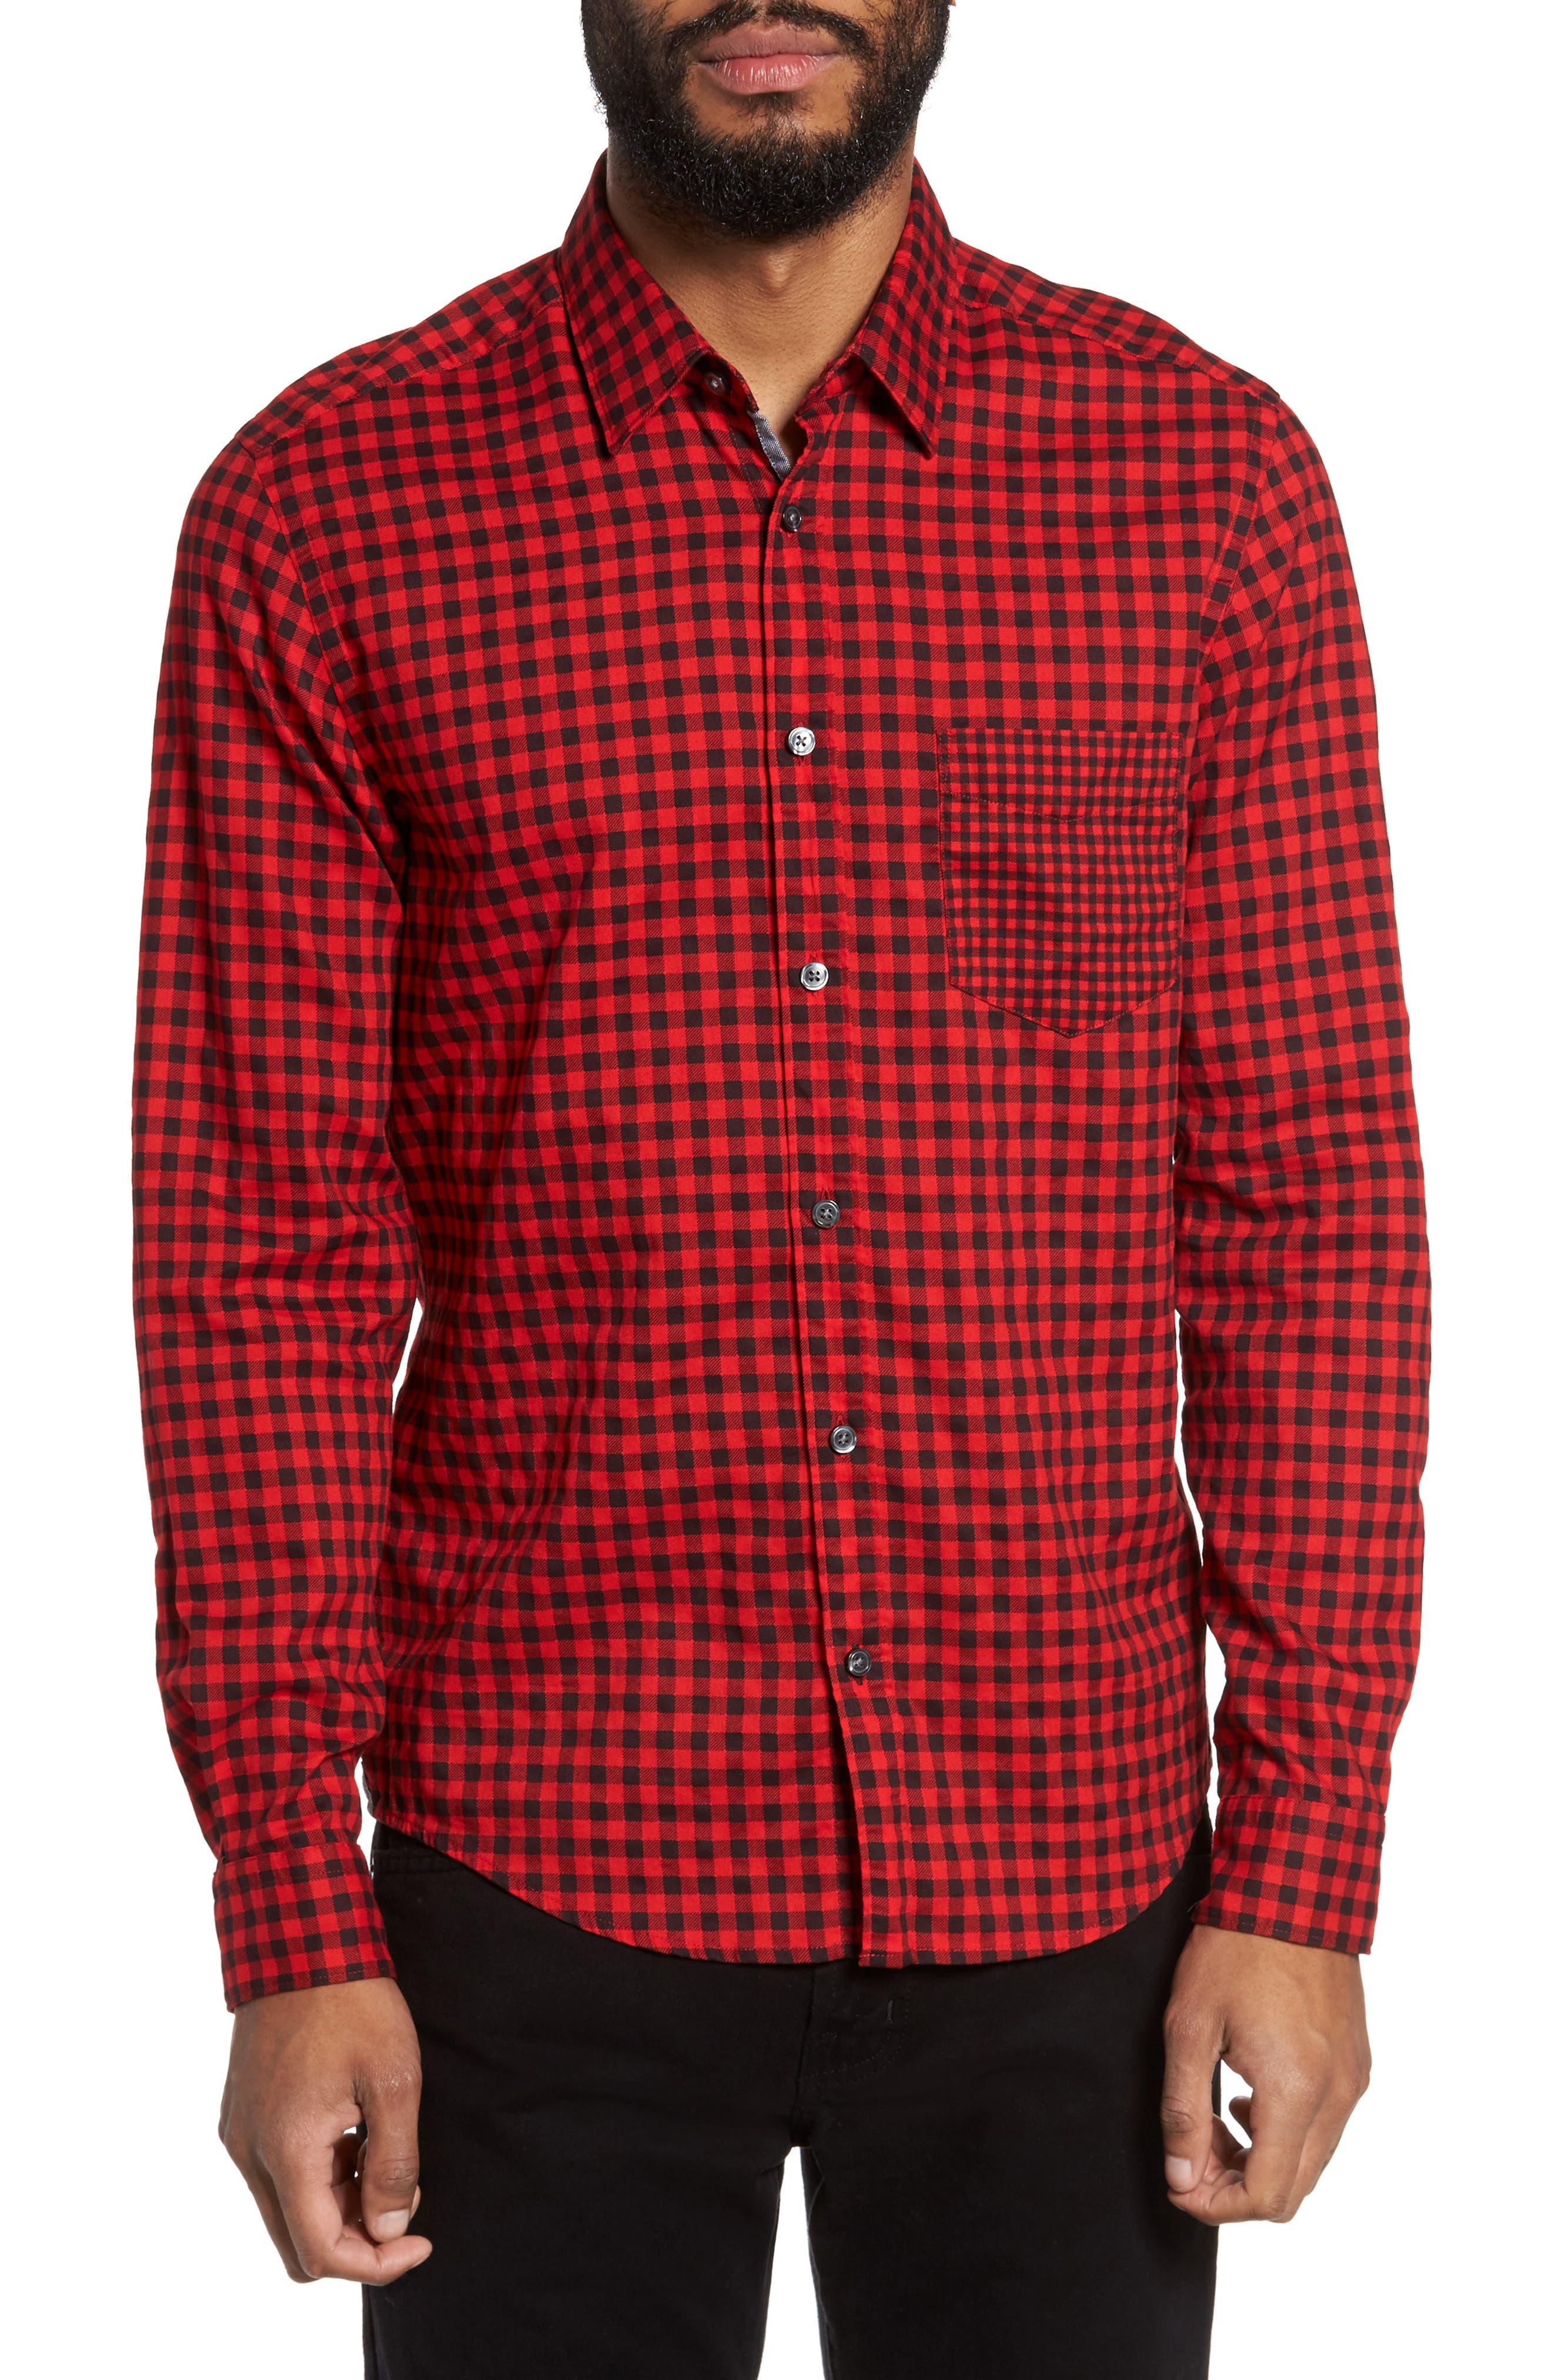 Alternate Image 1 Selected - BOSS Lance Regular Fit Gingham Check Twill Sport Shirt